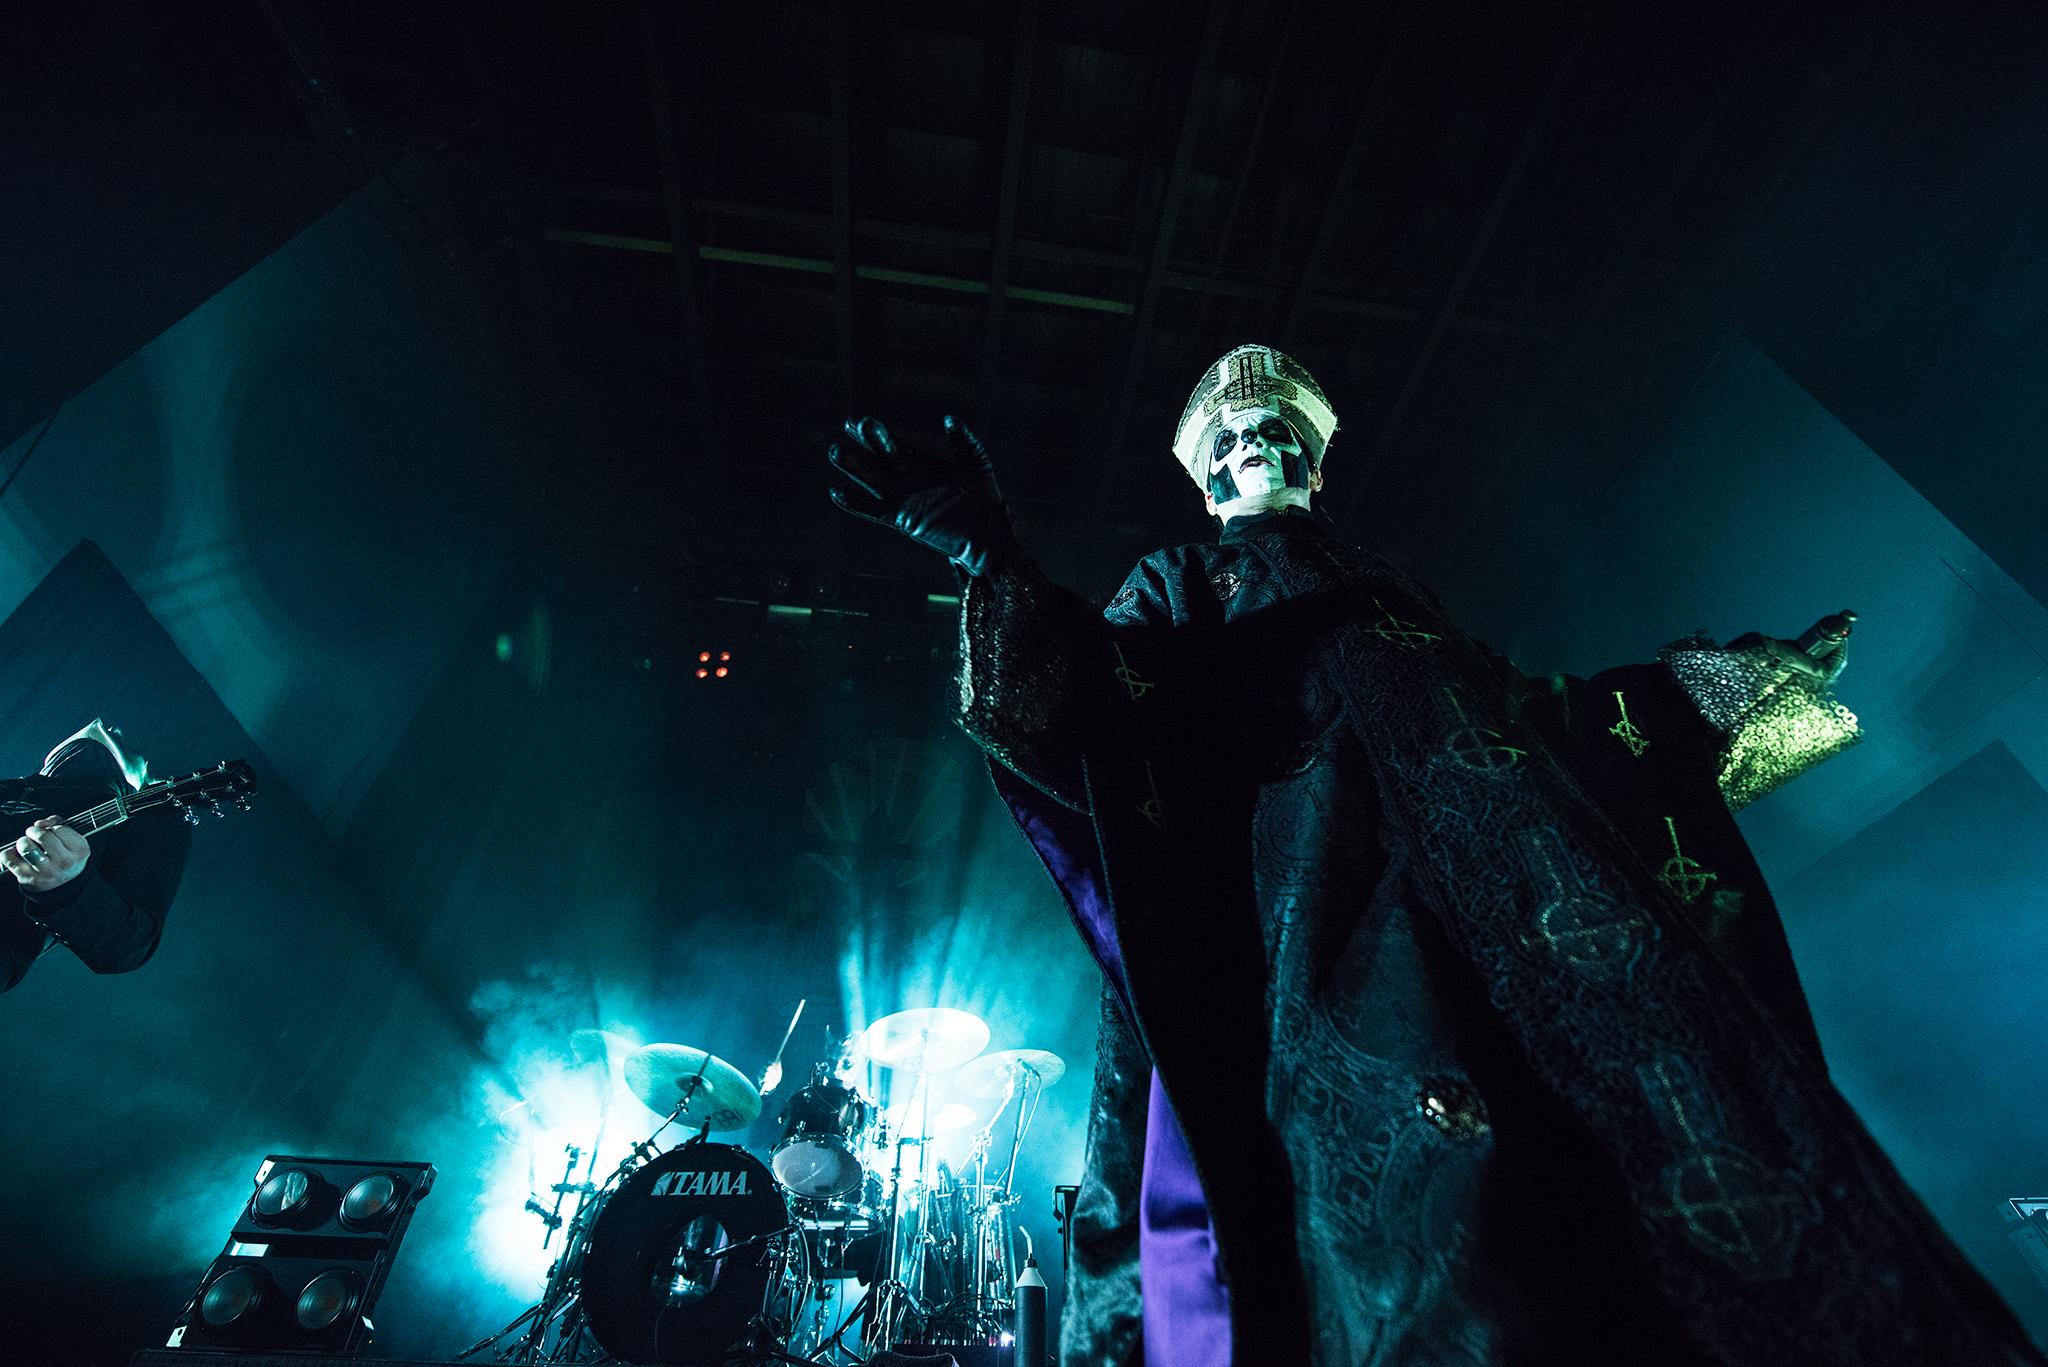 Ghost-Emos-Concert-Photography-Katrina-Barber-5.jpg